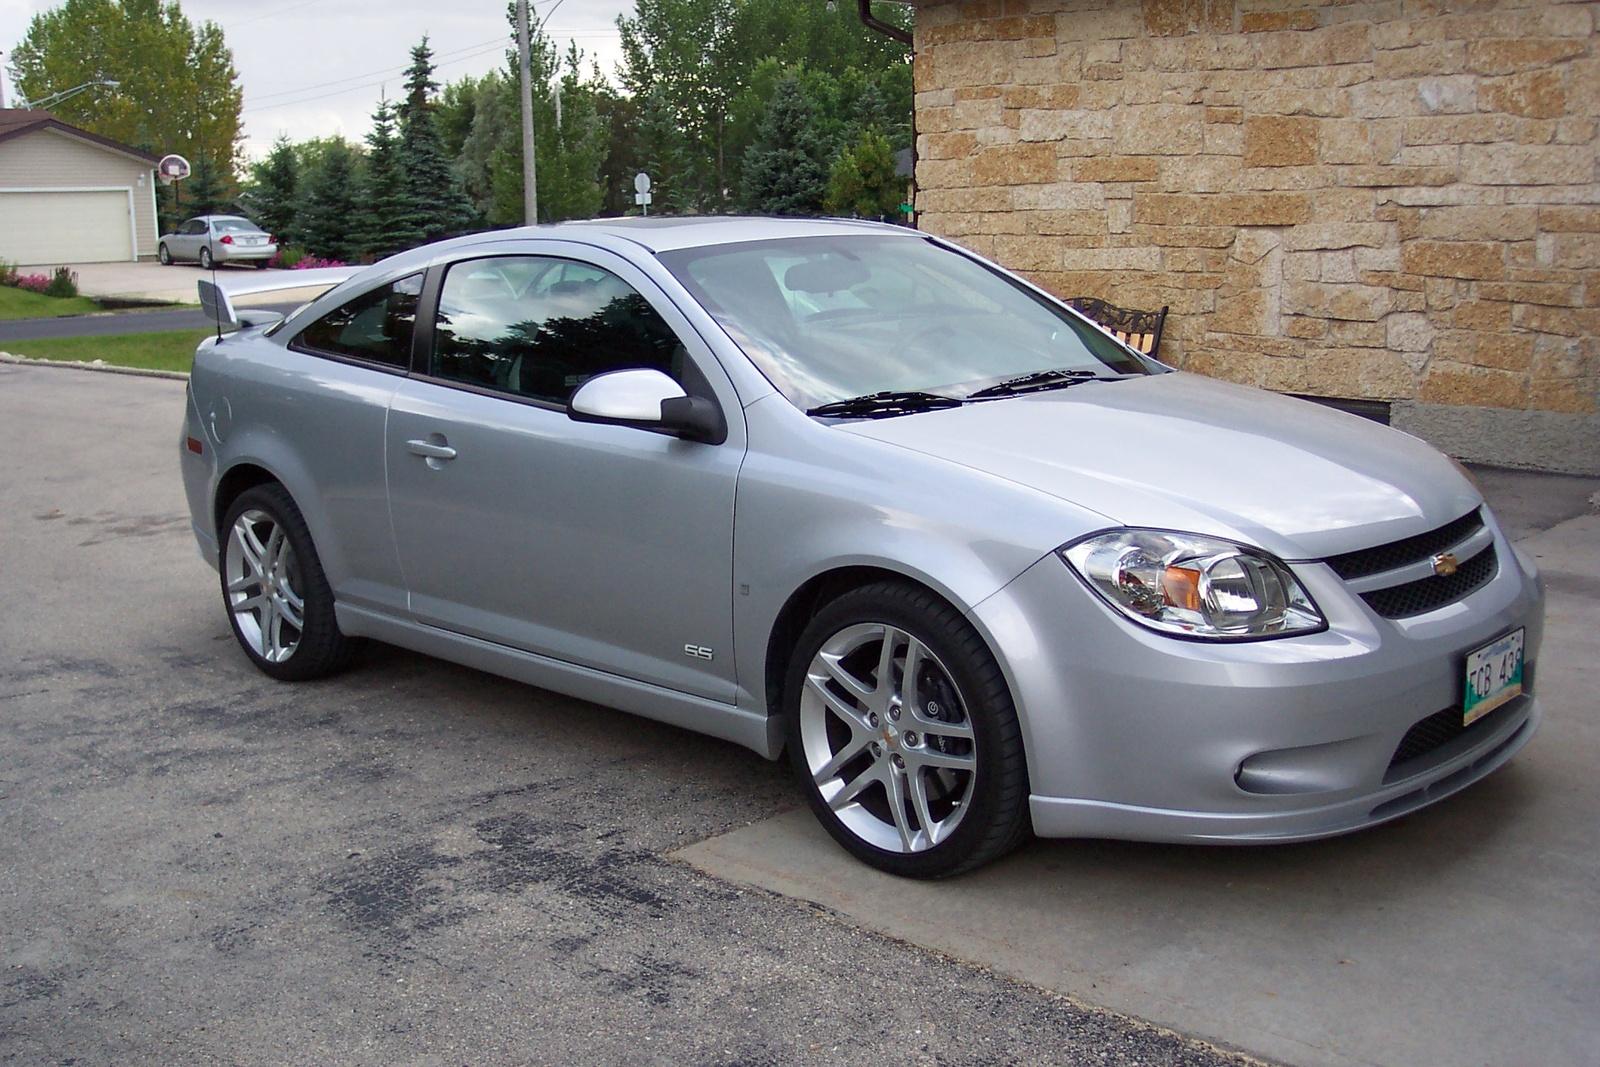 Cobalt chevy cobalt ls 2008 : 2008 Chevrolet Cobalt Sport Automatic related infomation ...